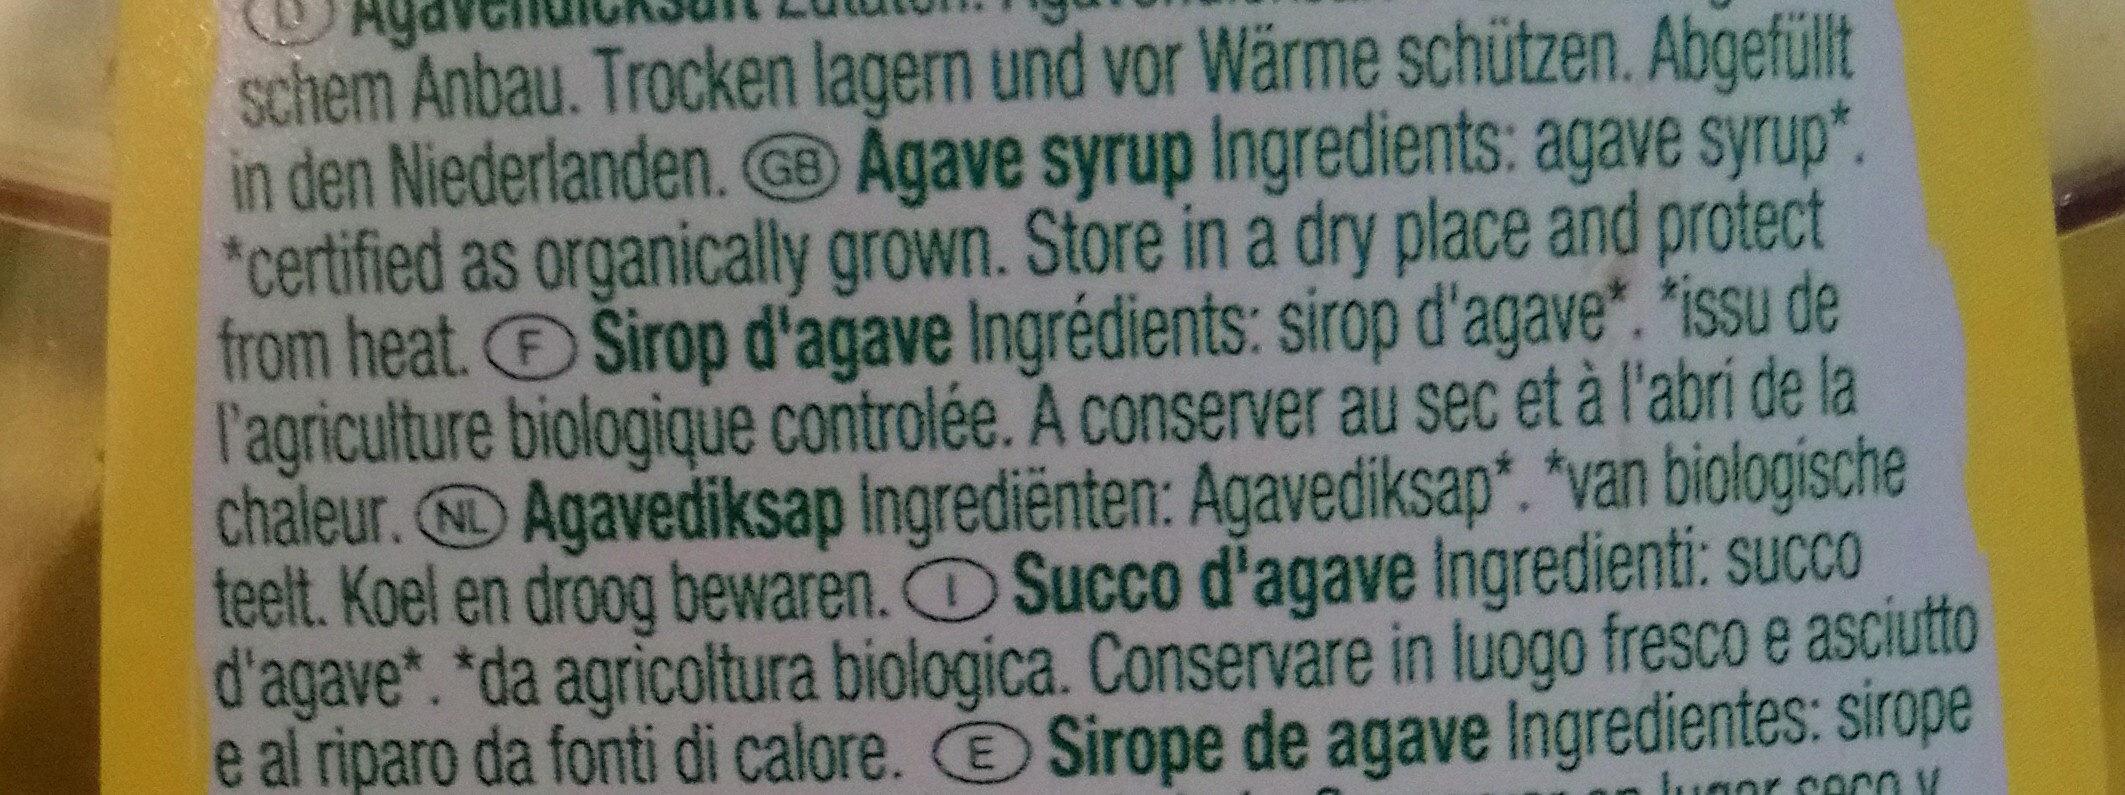 Sirop d'agave pur - Ingrédients - fr